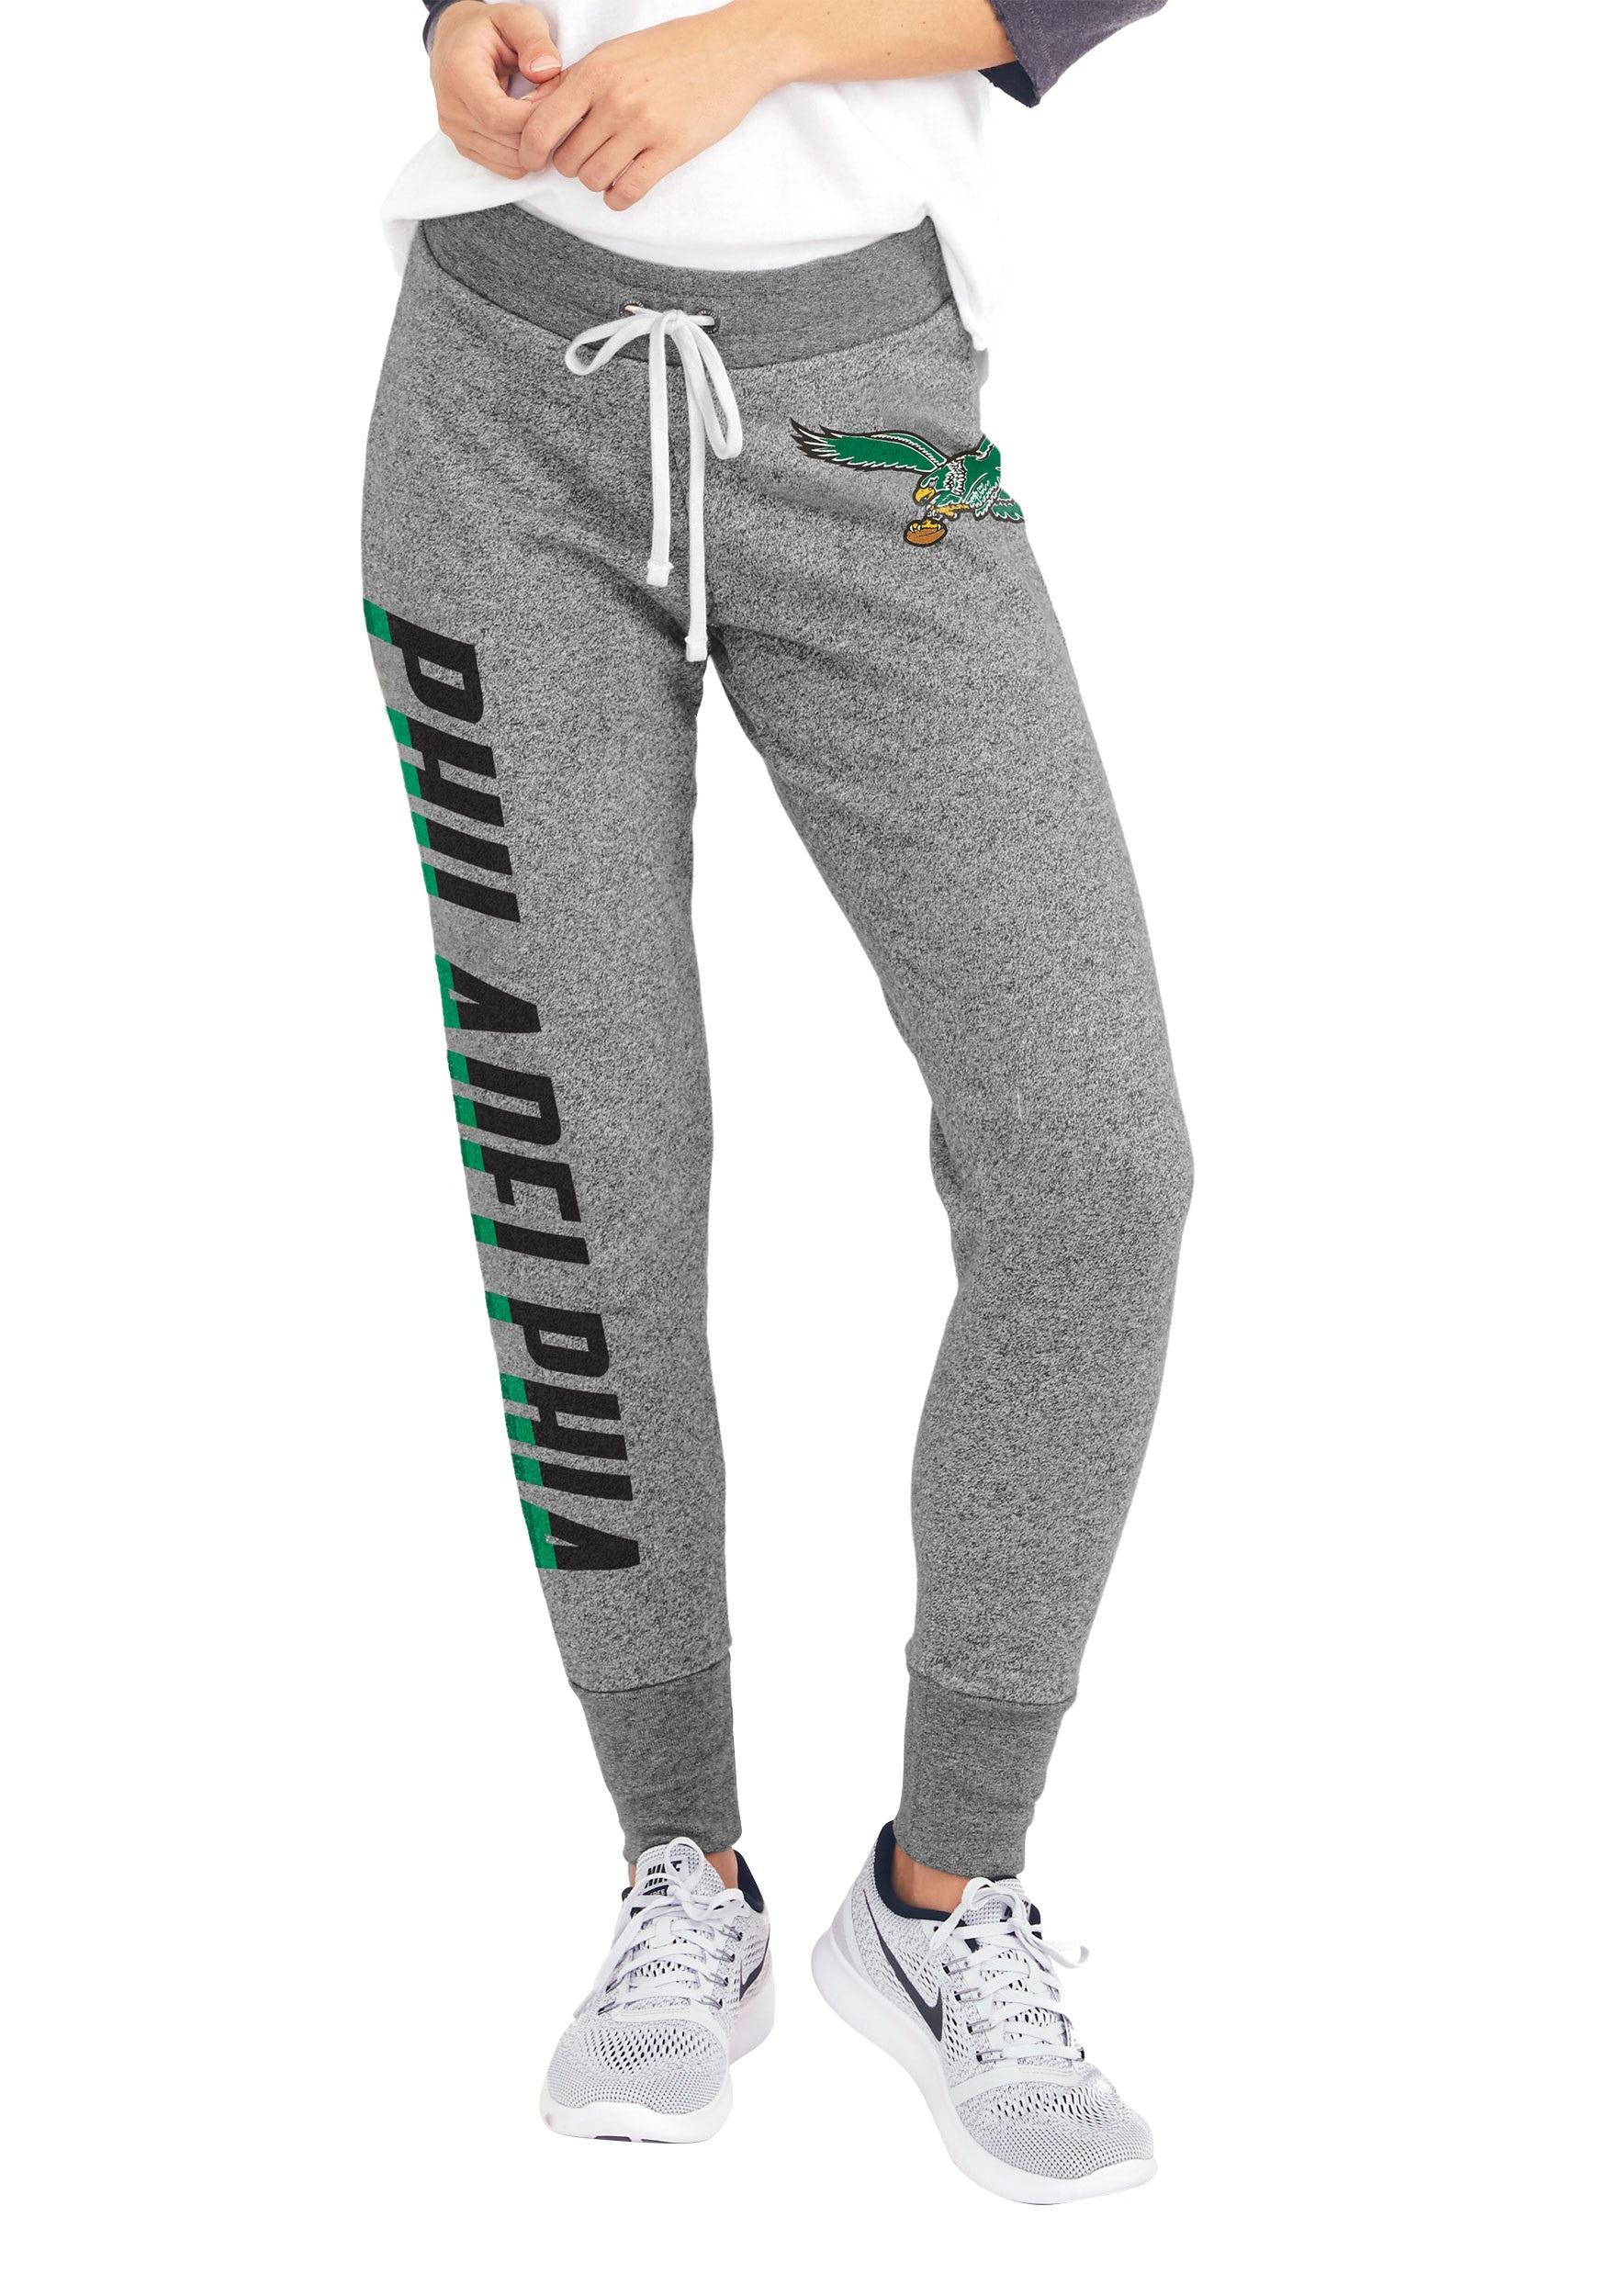 Philadelphia Eagles Sunday Sweatpants For Women